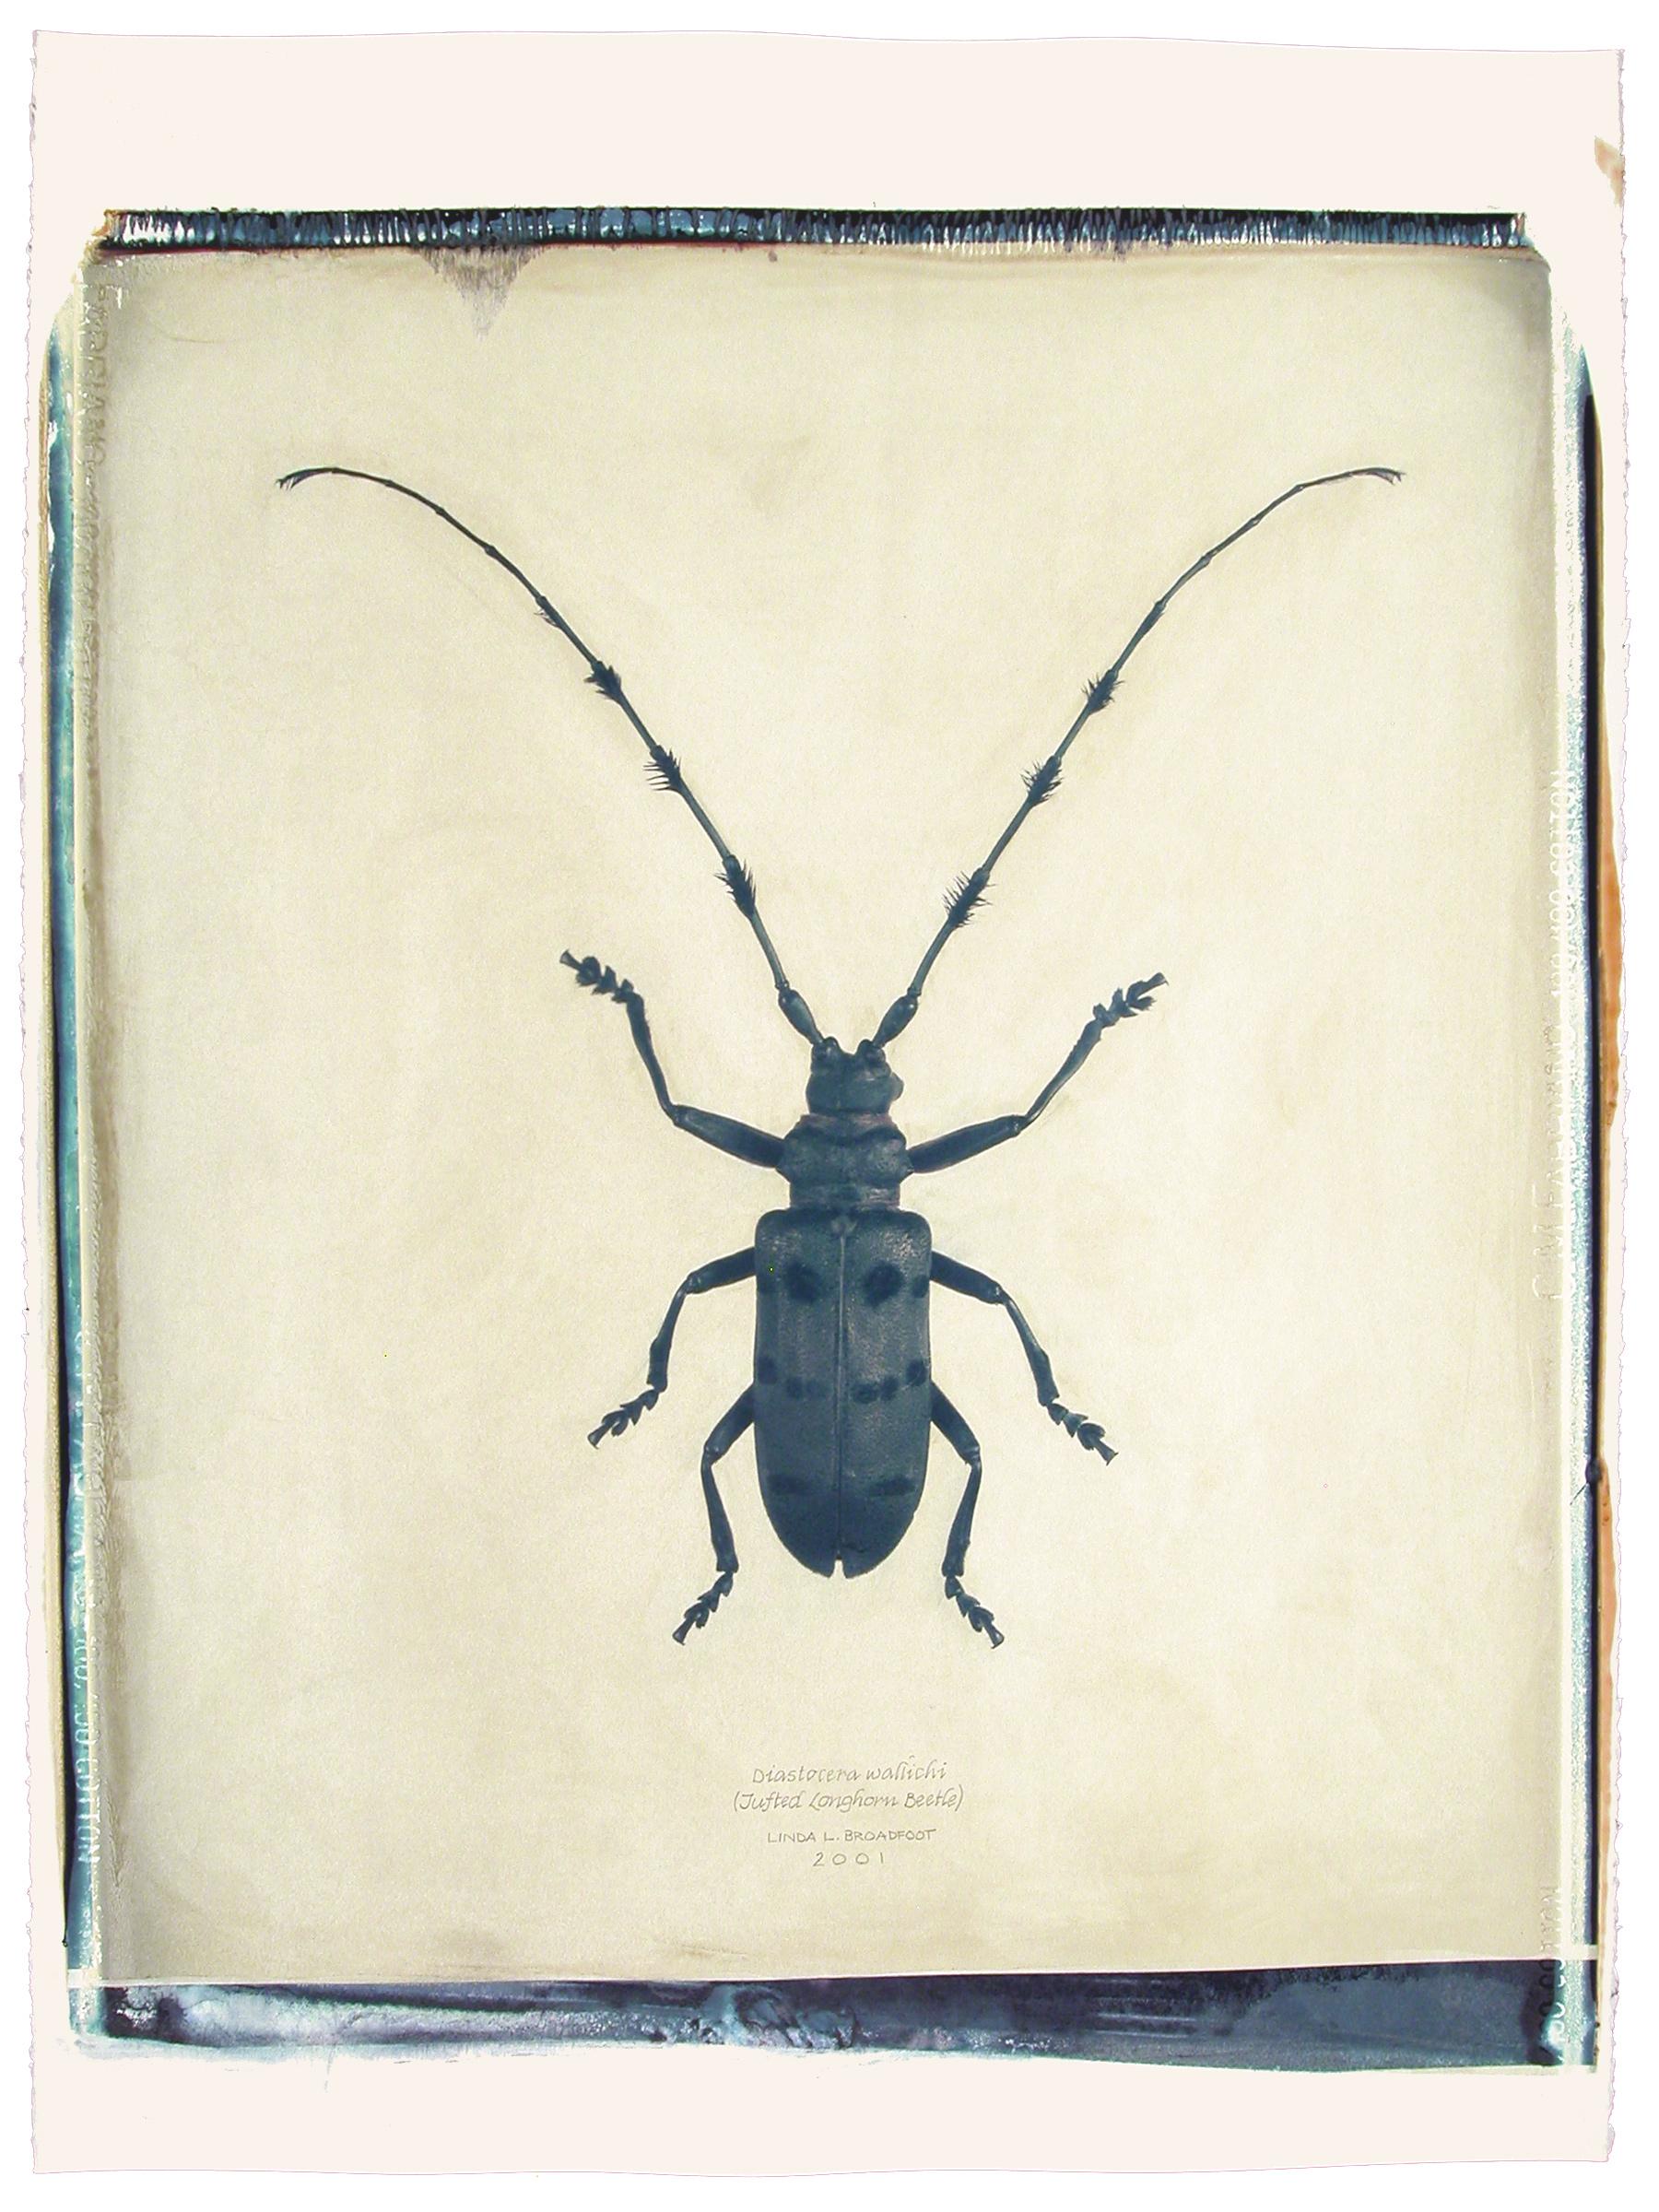 Diastocera wallichi  (Tufted Longhorn Beetle), 2001